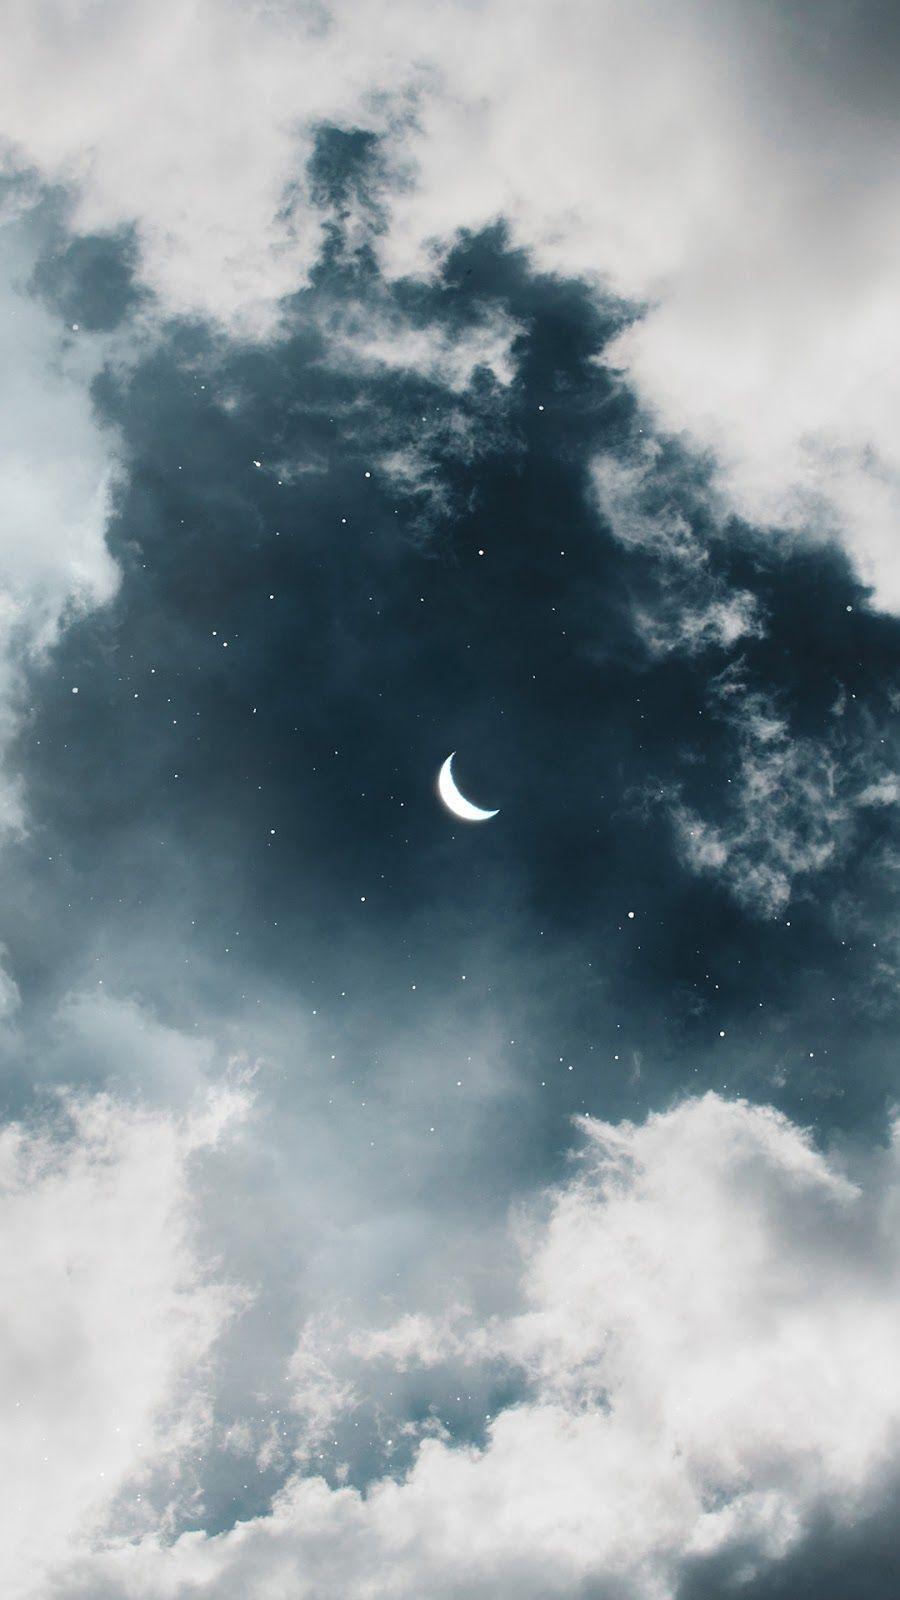 Moon In The Night Sky Iphone Wallpaper Moon Night Sky Wallpaper Iphone Wallpaper Sky